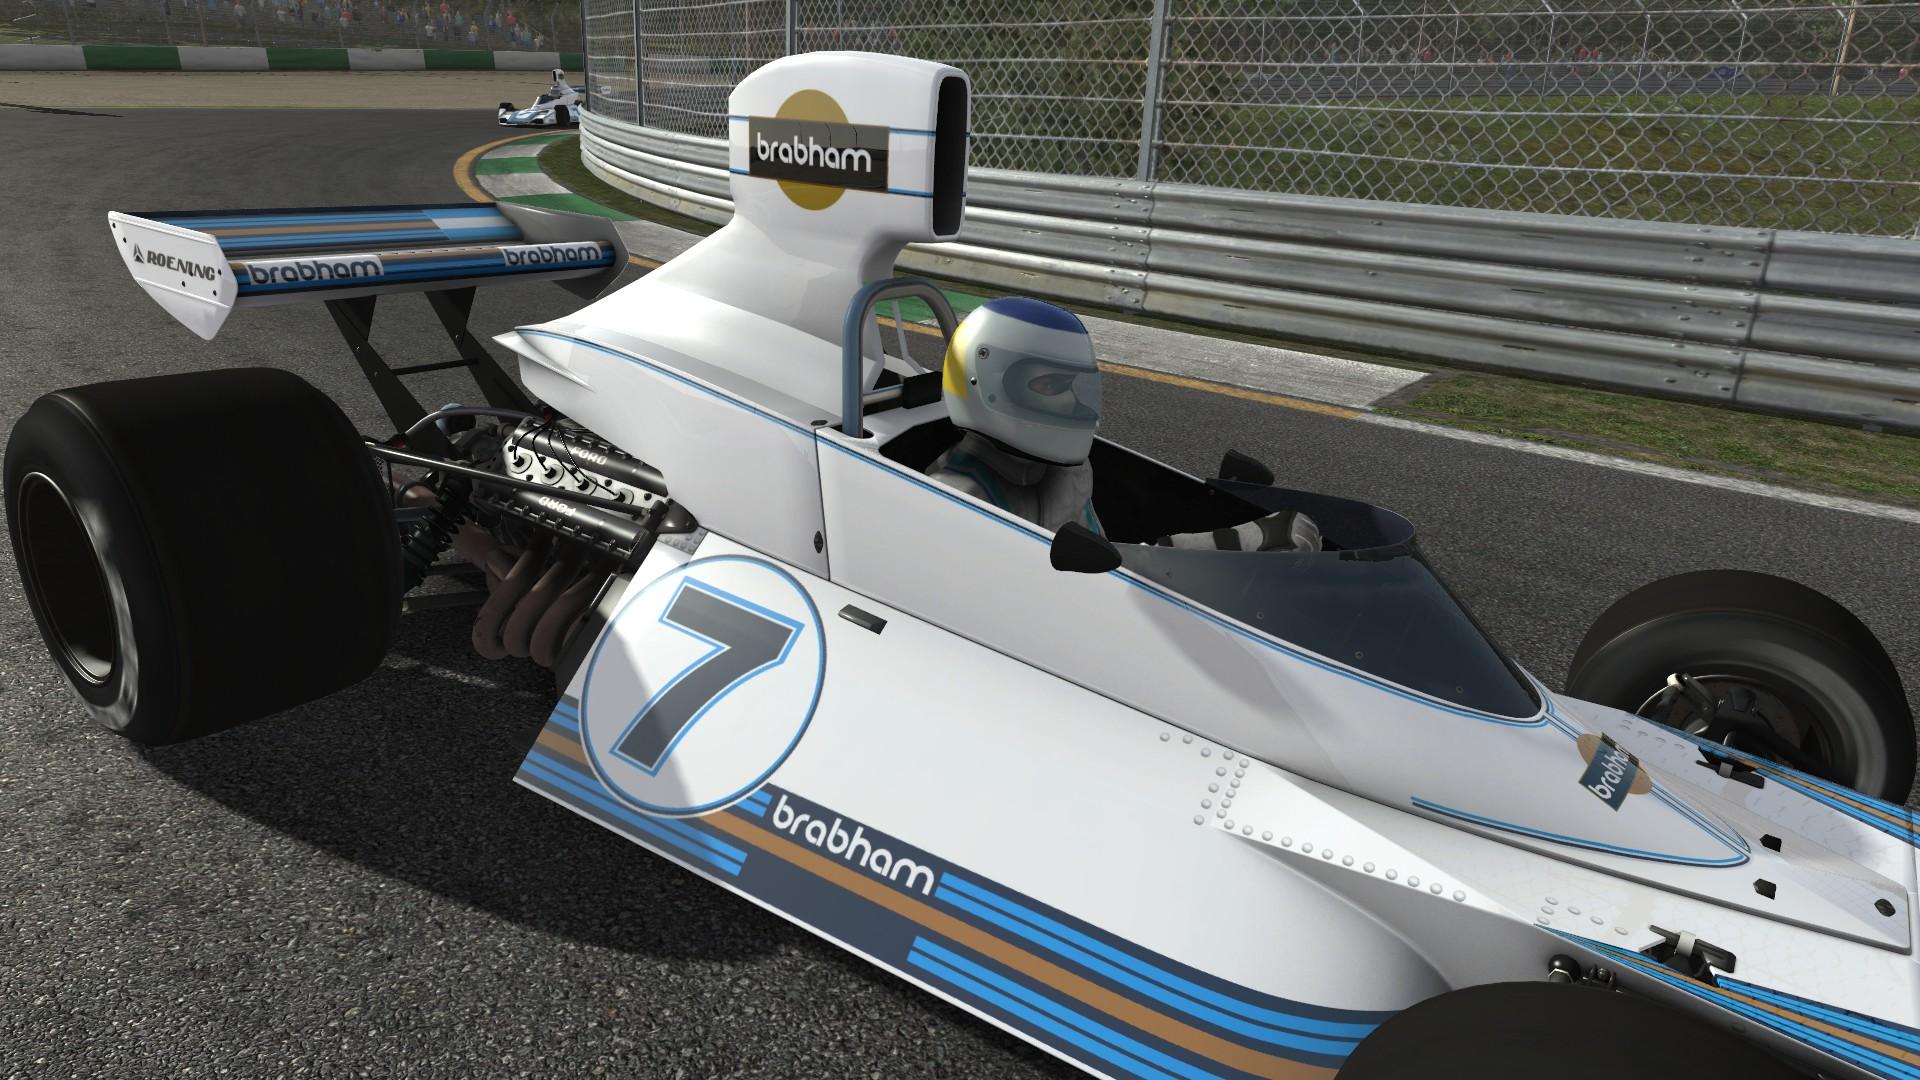 BrabhamBT44_v080_2.jpg